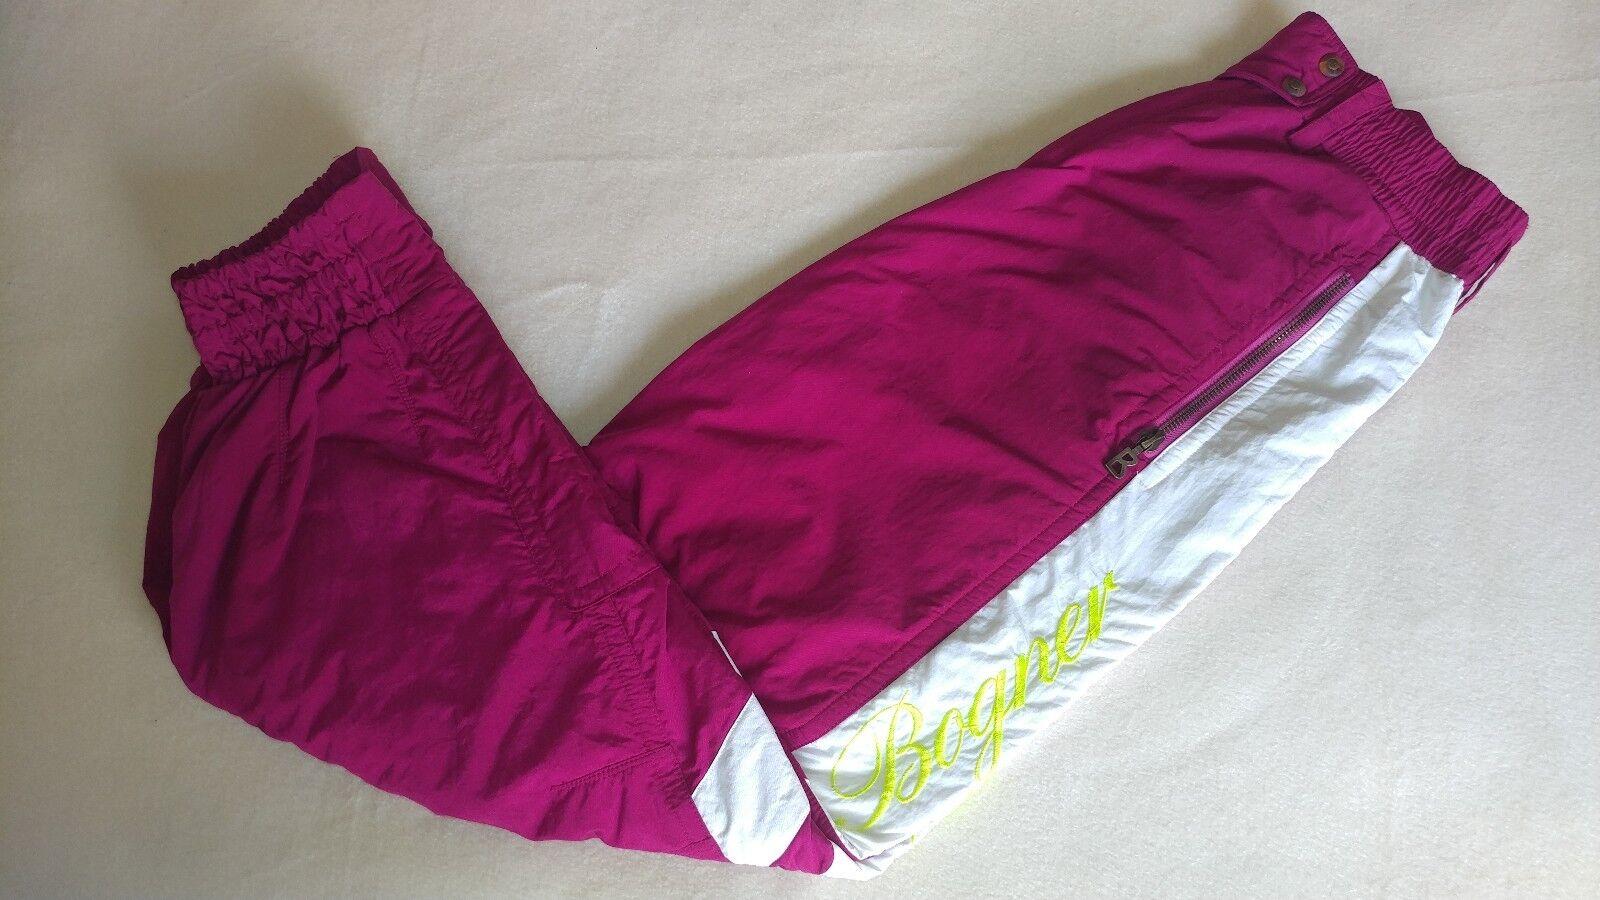 Vintage Bogner Women's Ski Pants Rare Embroidered Snowboard Sz 10 Top Condition